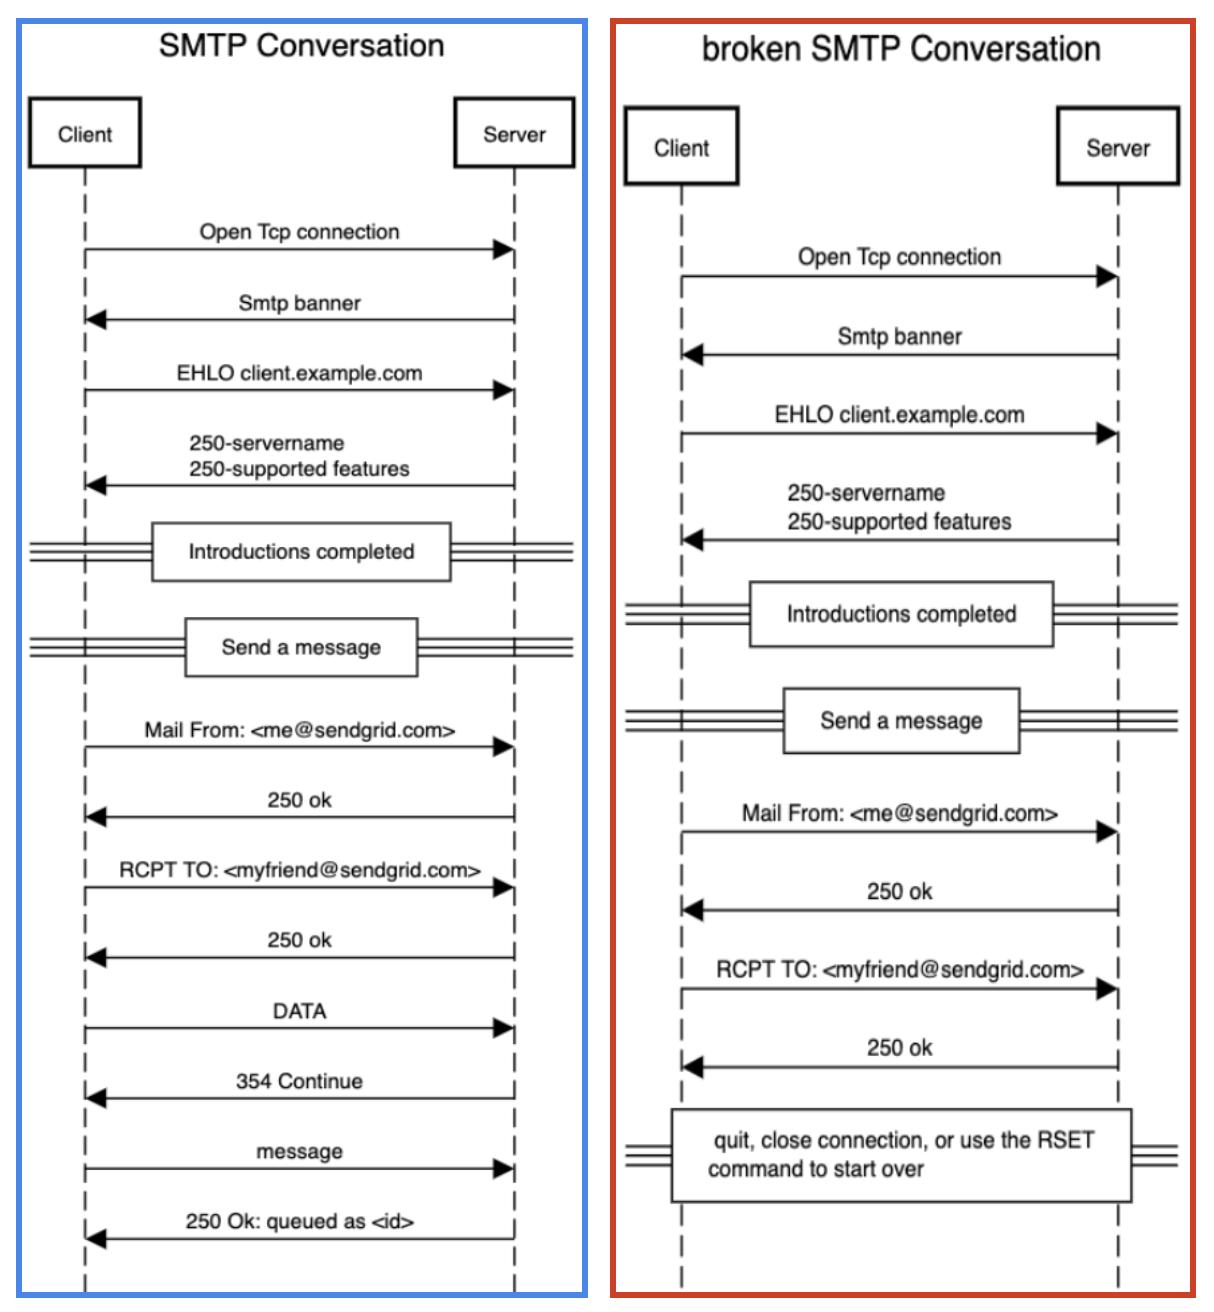 SMTP vs Broken SMTP